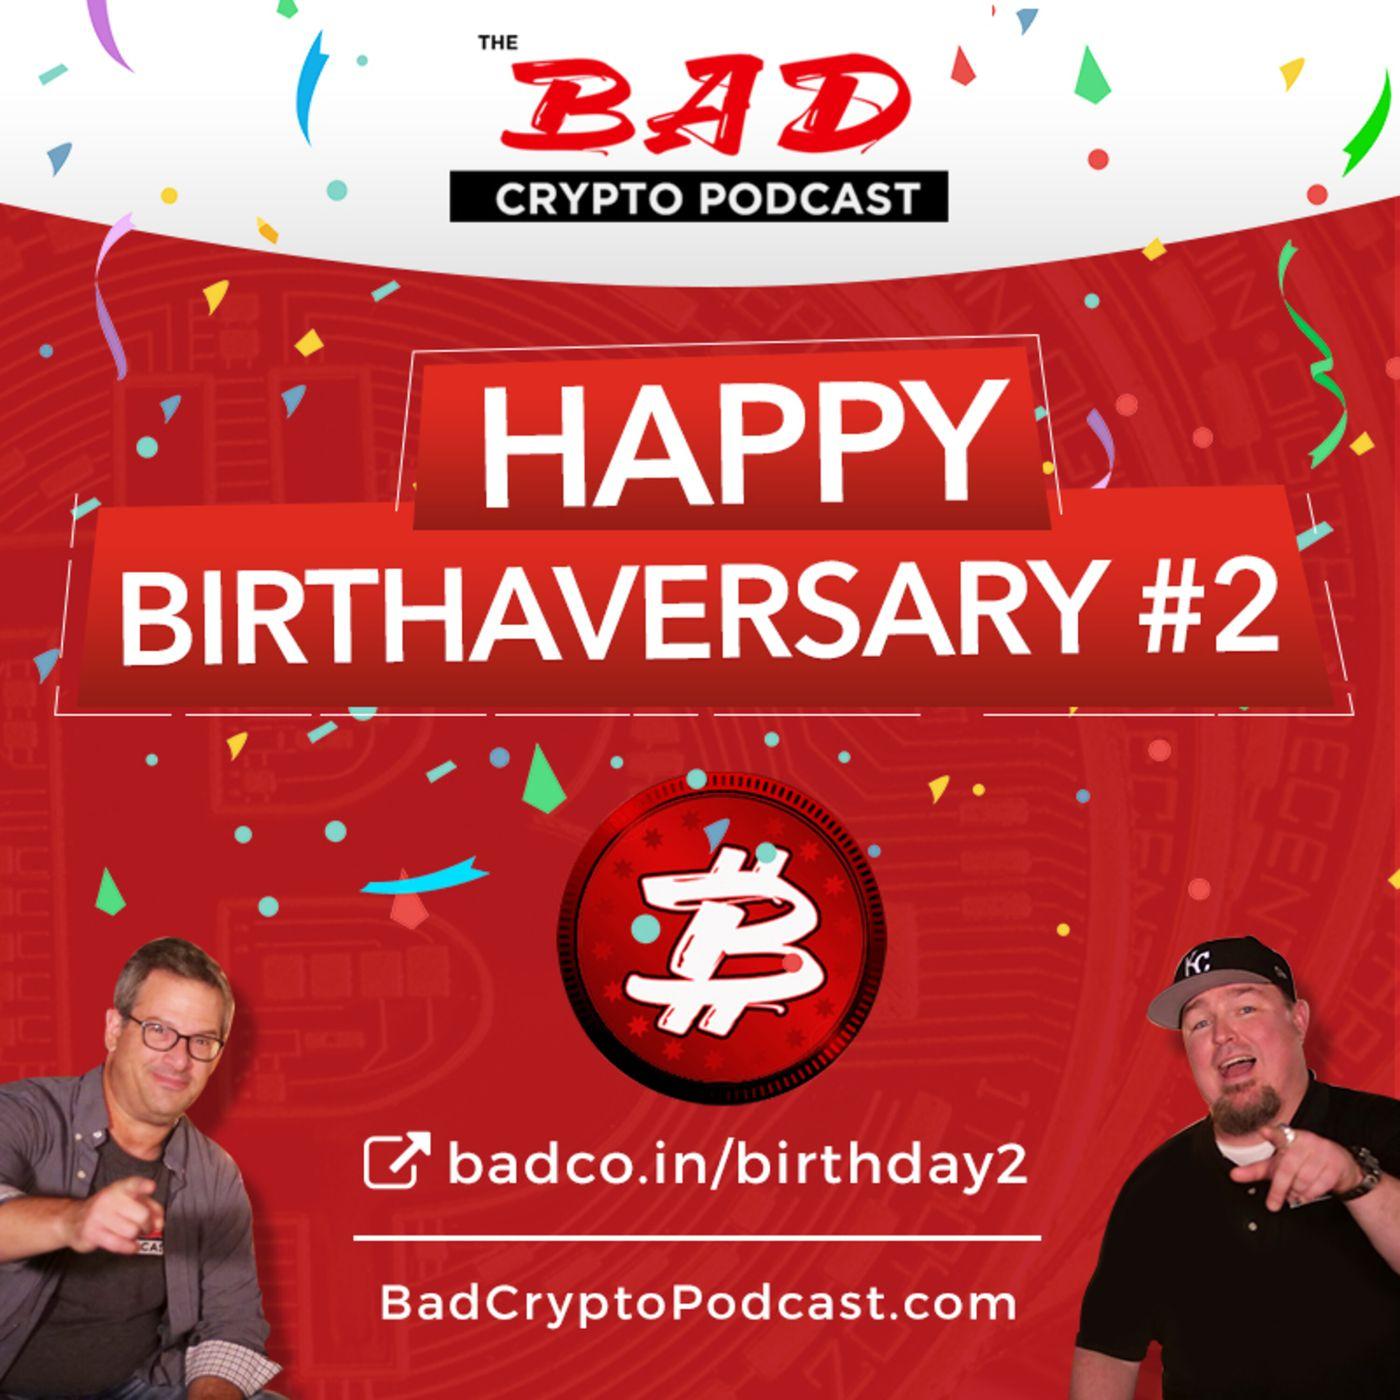 Happy Birthaversary #2!